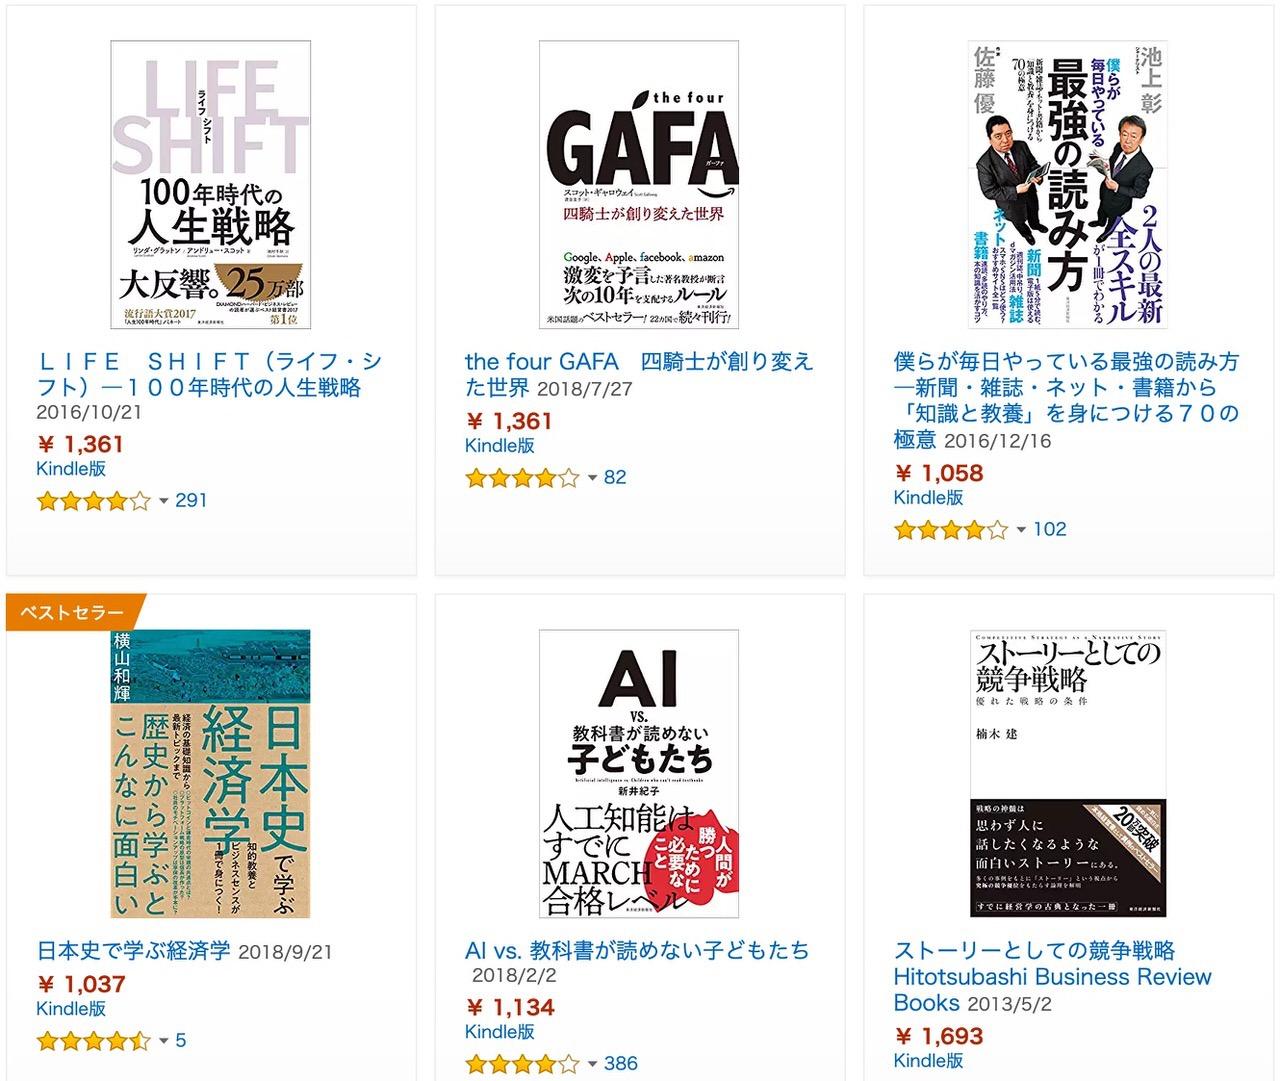 【Kindleセール】「東洋経済 ビジネス書フェア」(3/7まで)